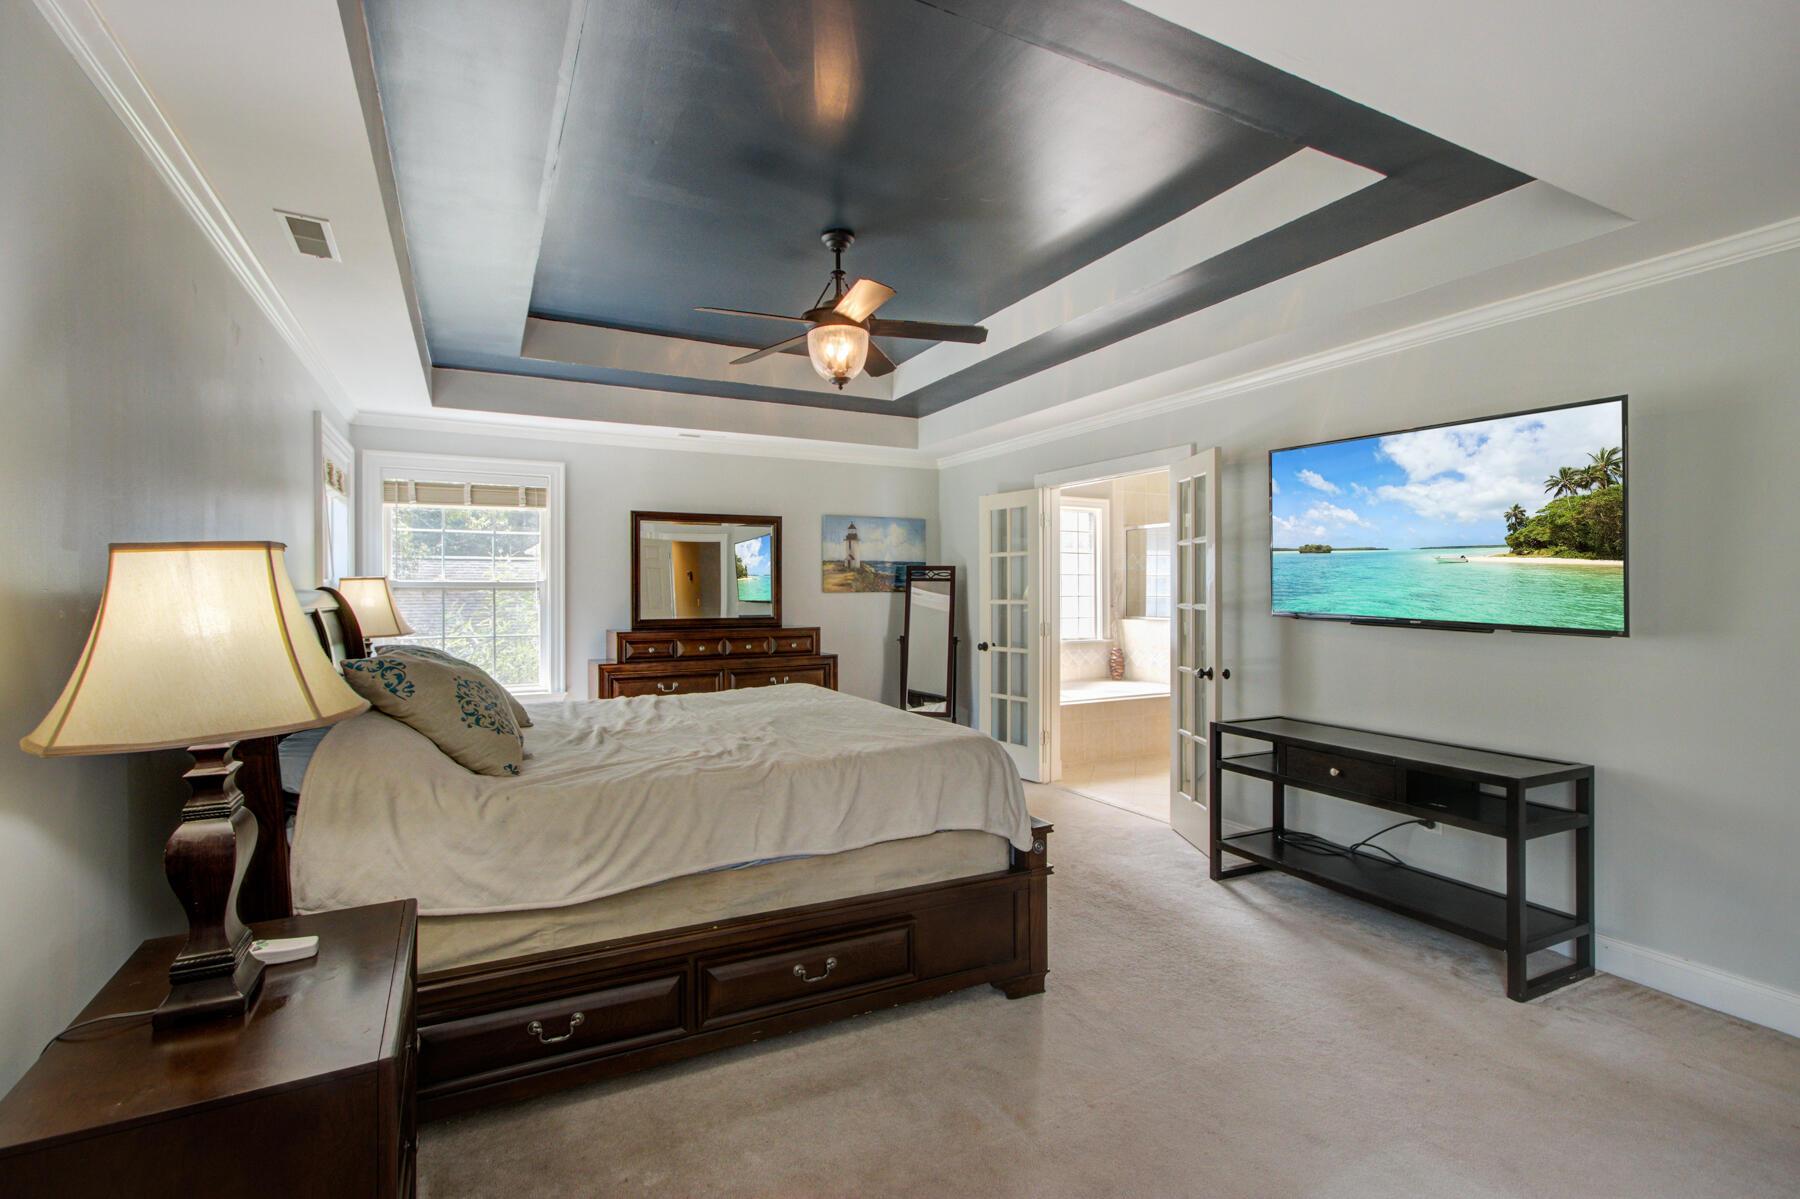 Dunes West Homes For Sale - 3095 Pignatelli, Mount Pleasant, SC - 38